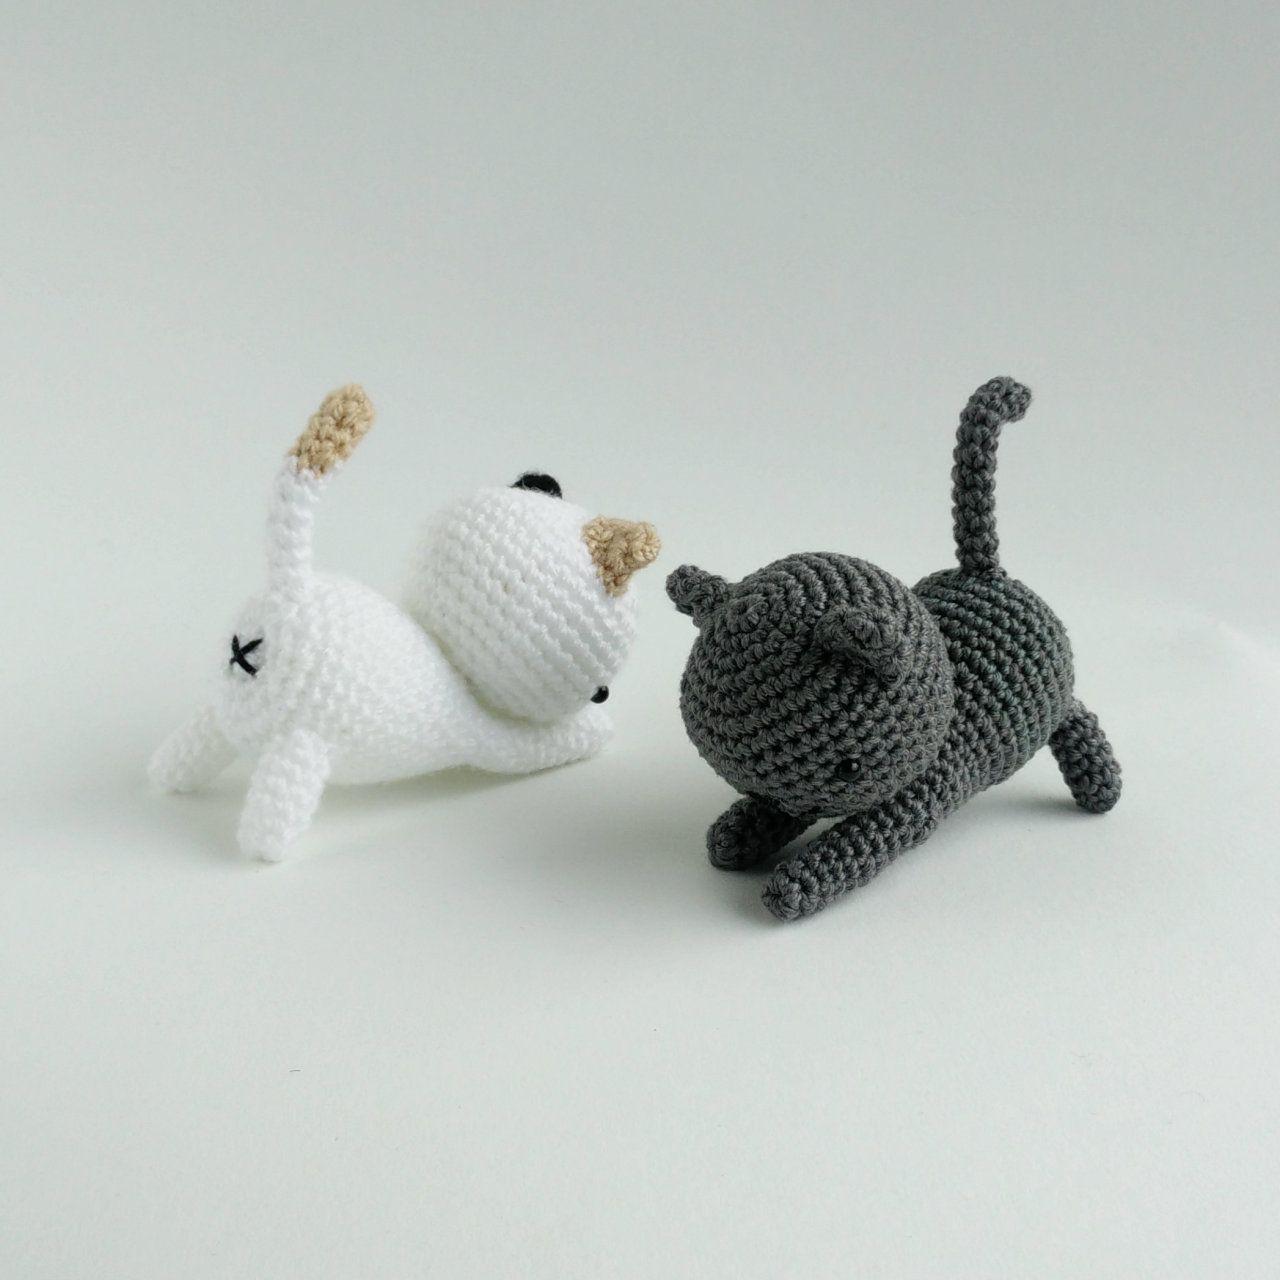 Free pattern: Neko Atsume #2 | Pinterest | Patrones amigurumi ...